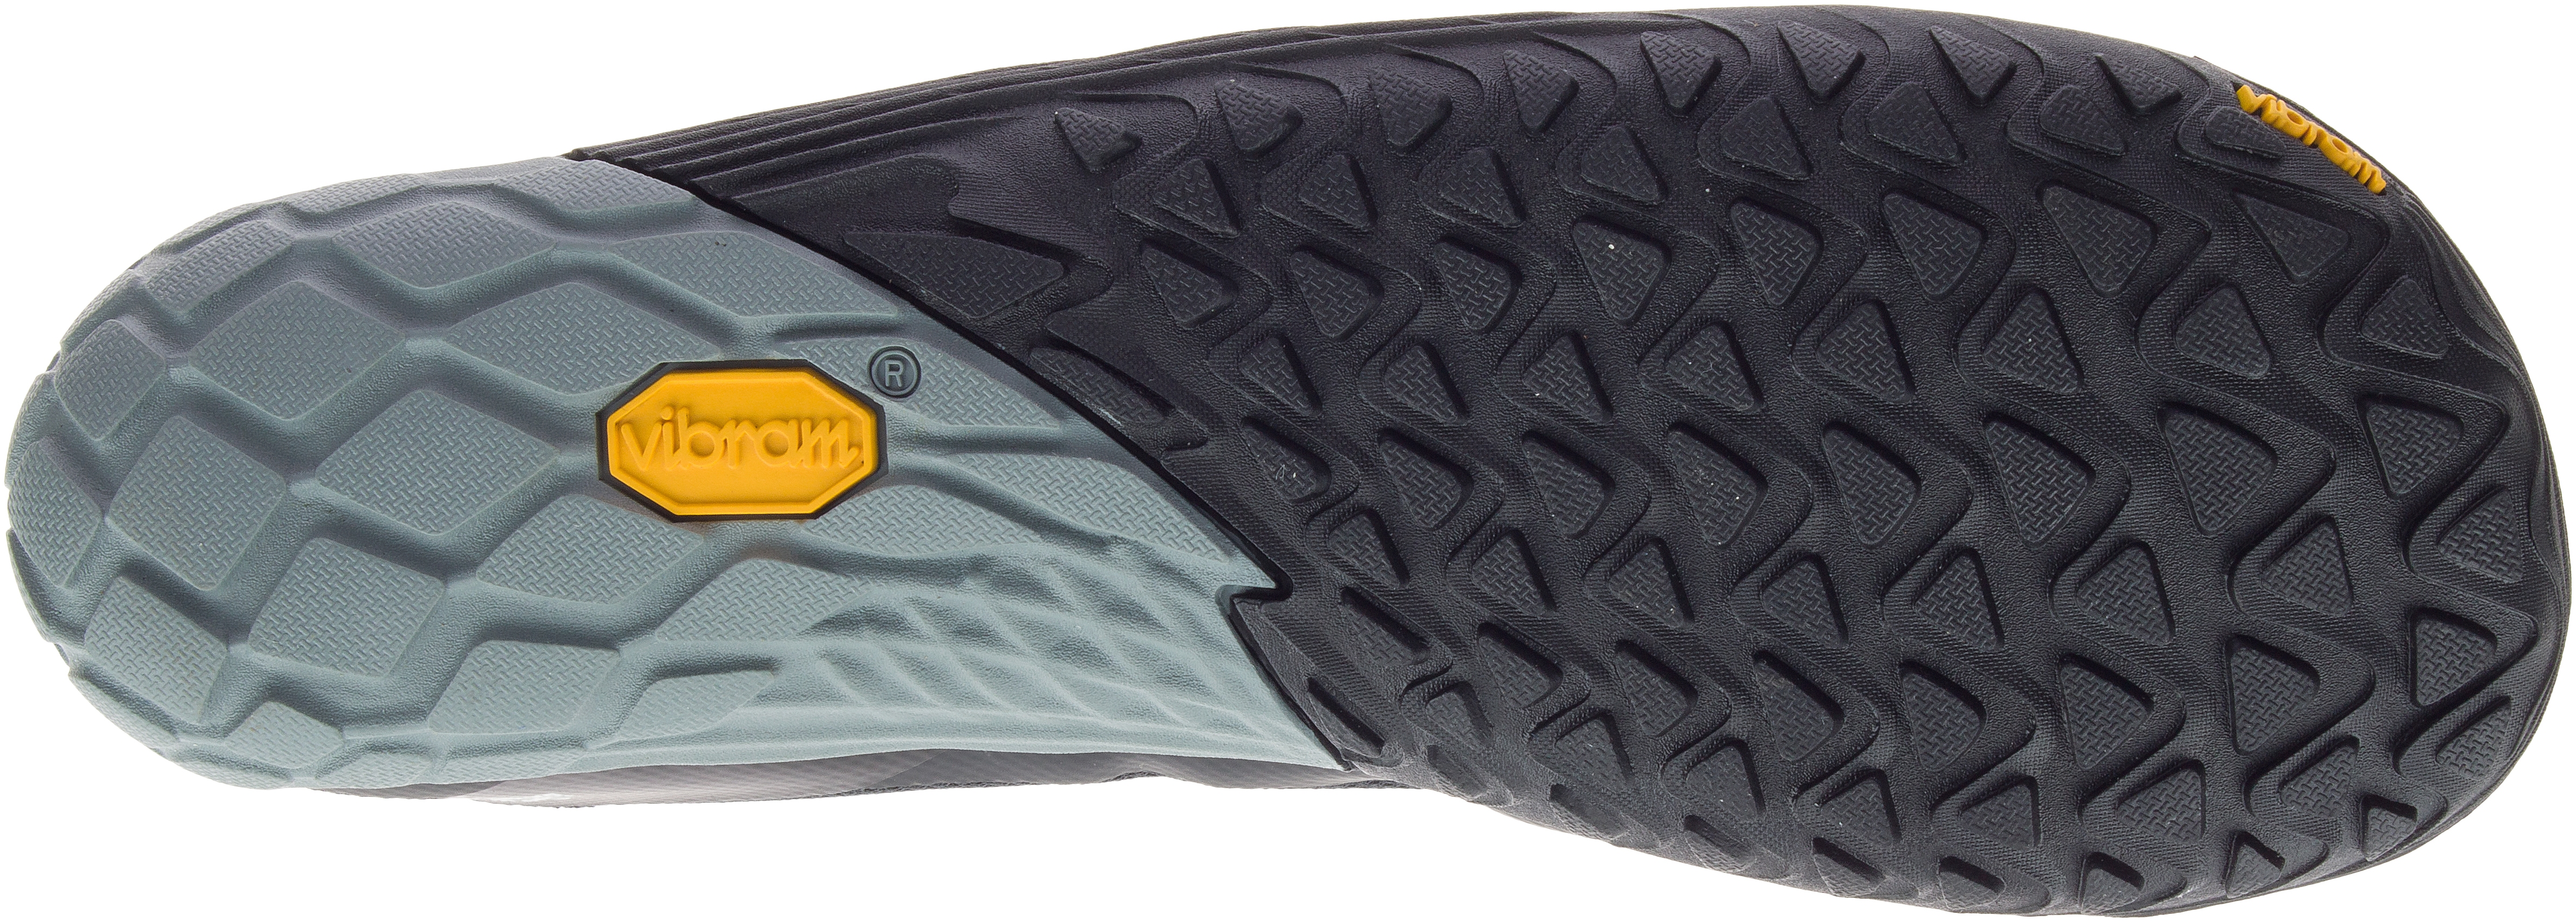 Vapor Glove 4, Black-black